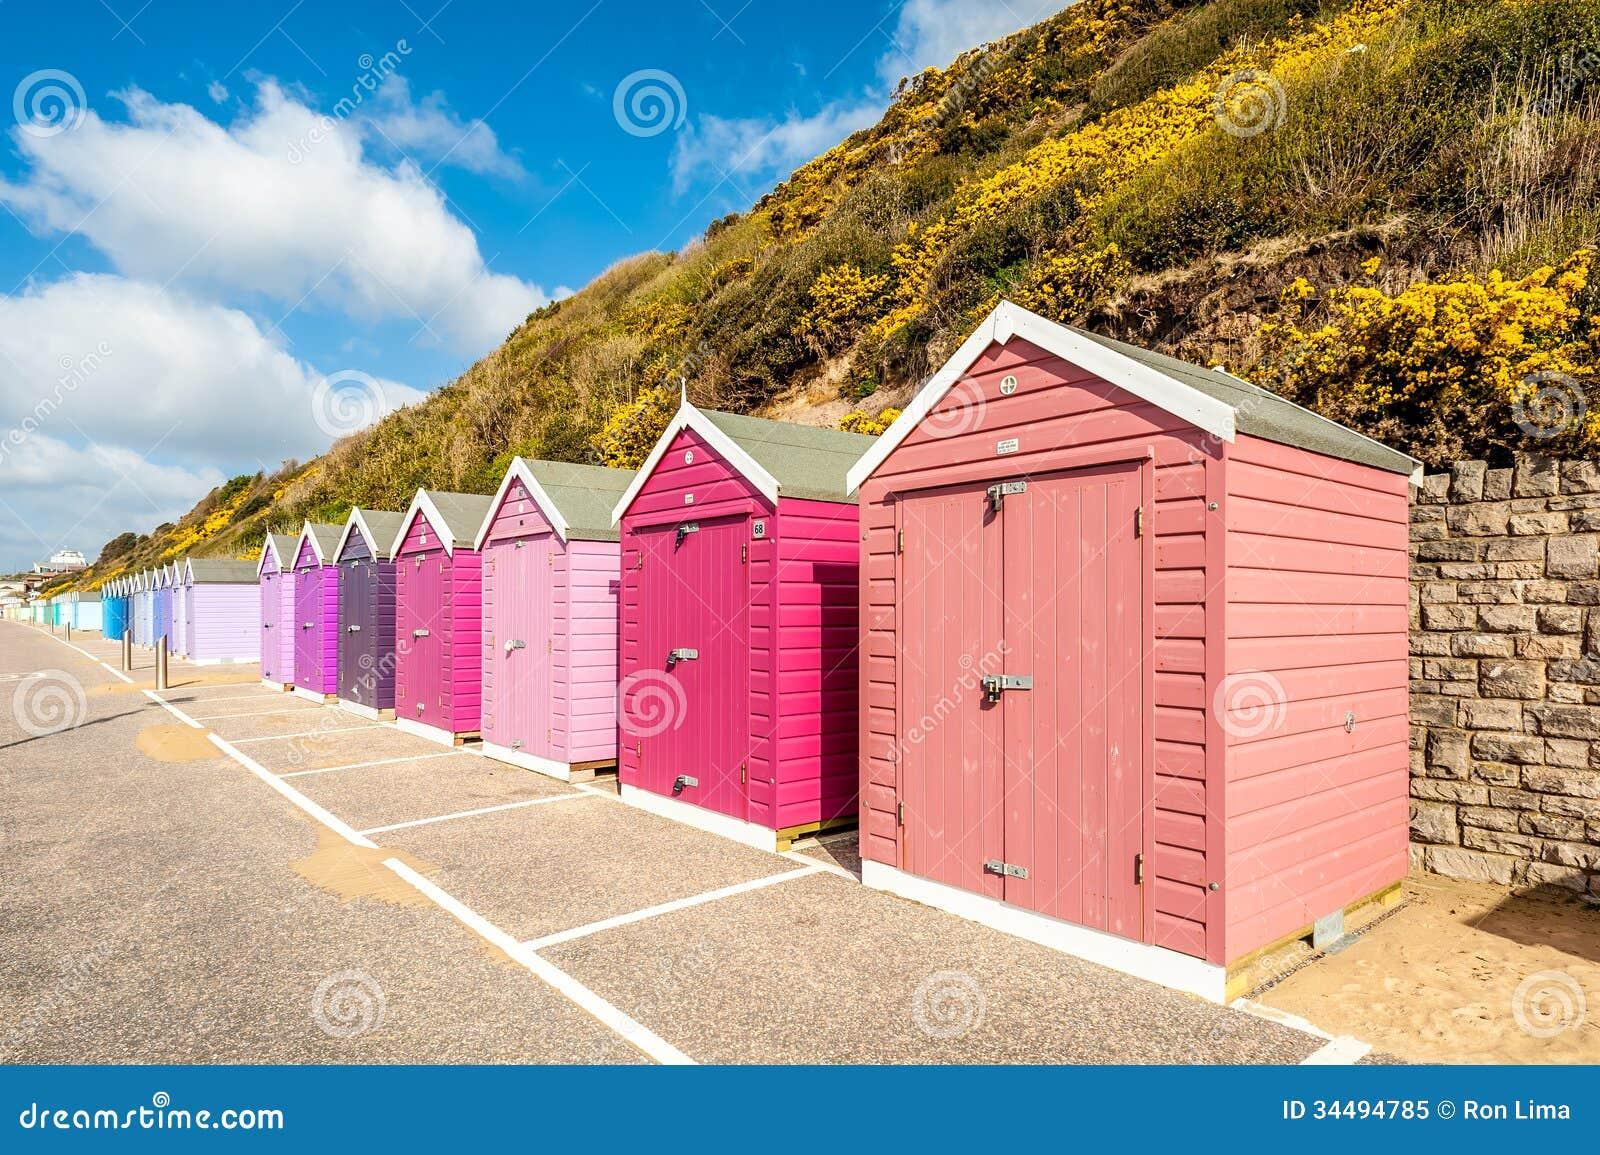 Charmant Download Storage Beach Huts Stock Image. Image Of Natural, Nature   34494785